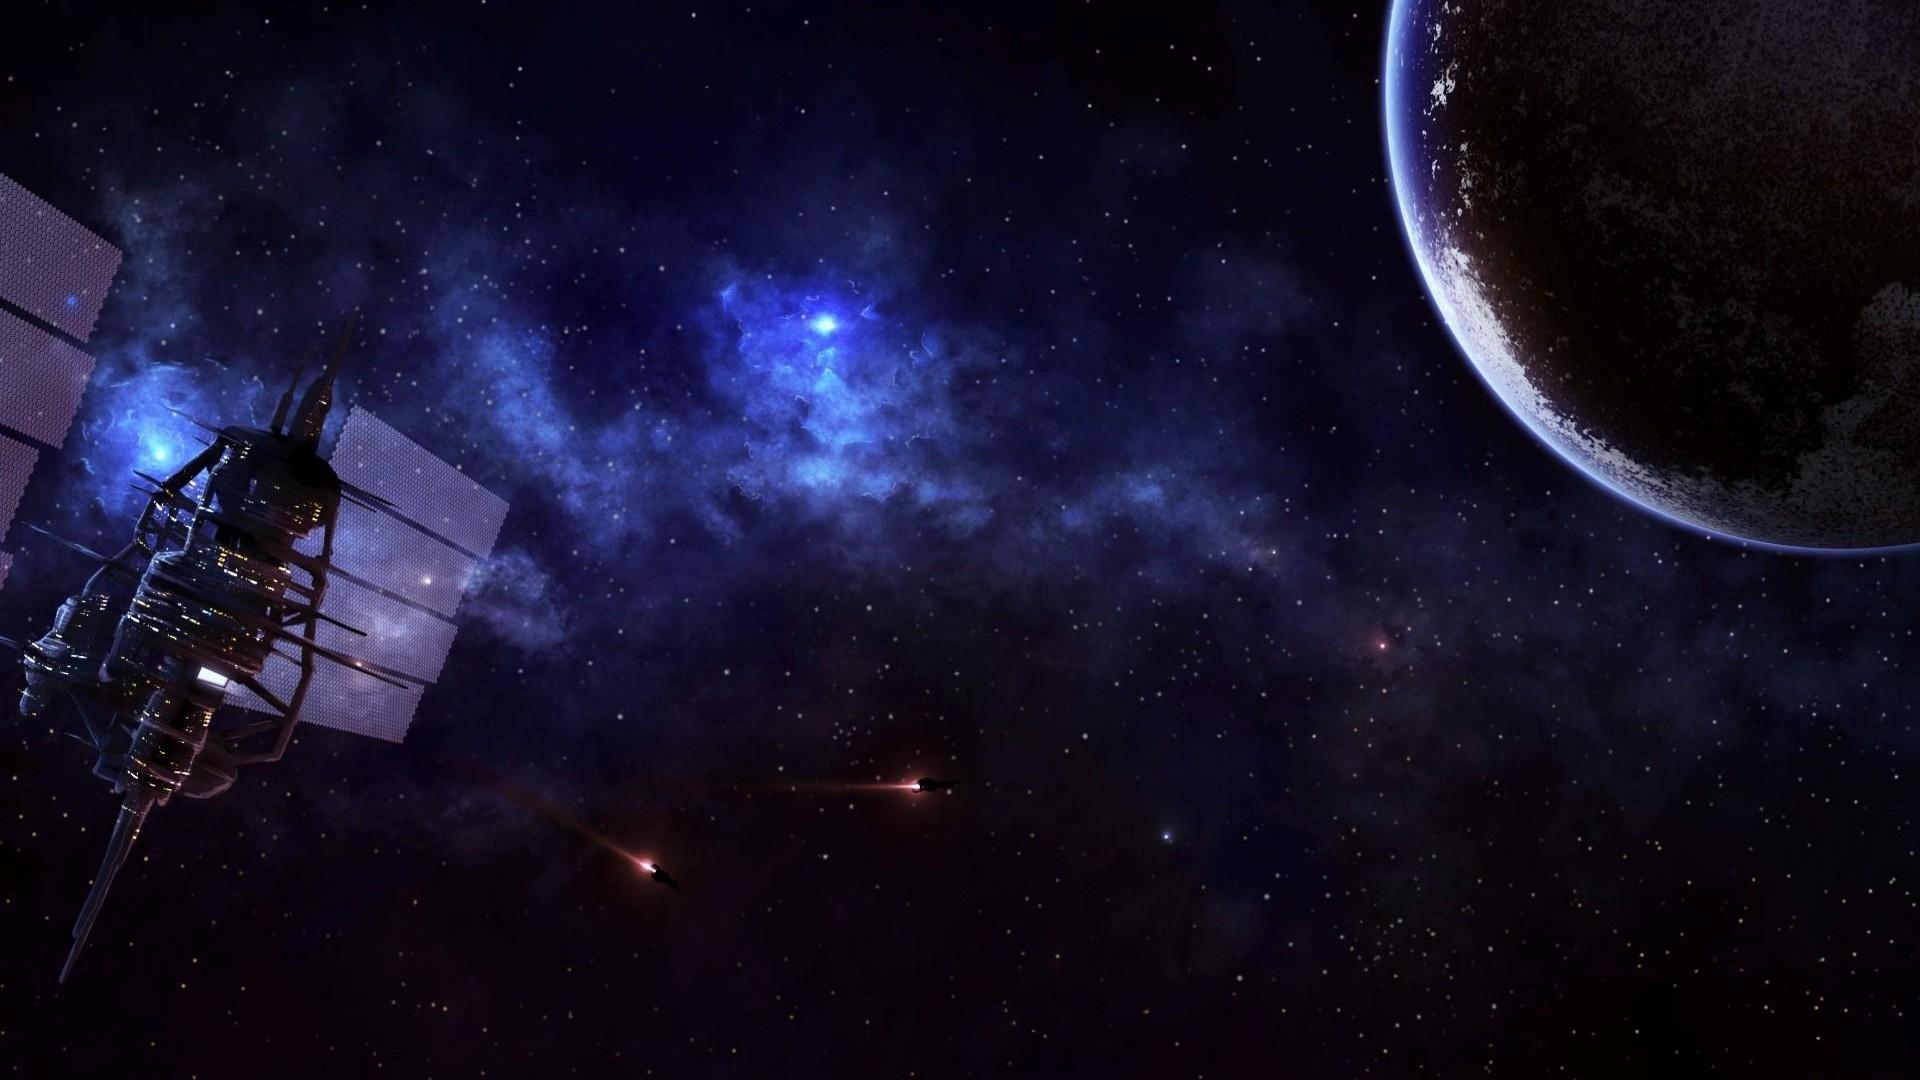 Wallpaper satellite, planet, universe, stars, nebula